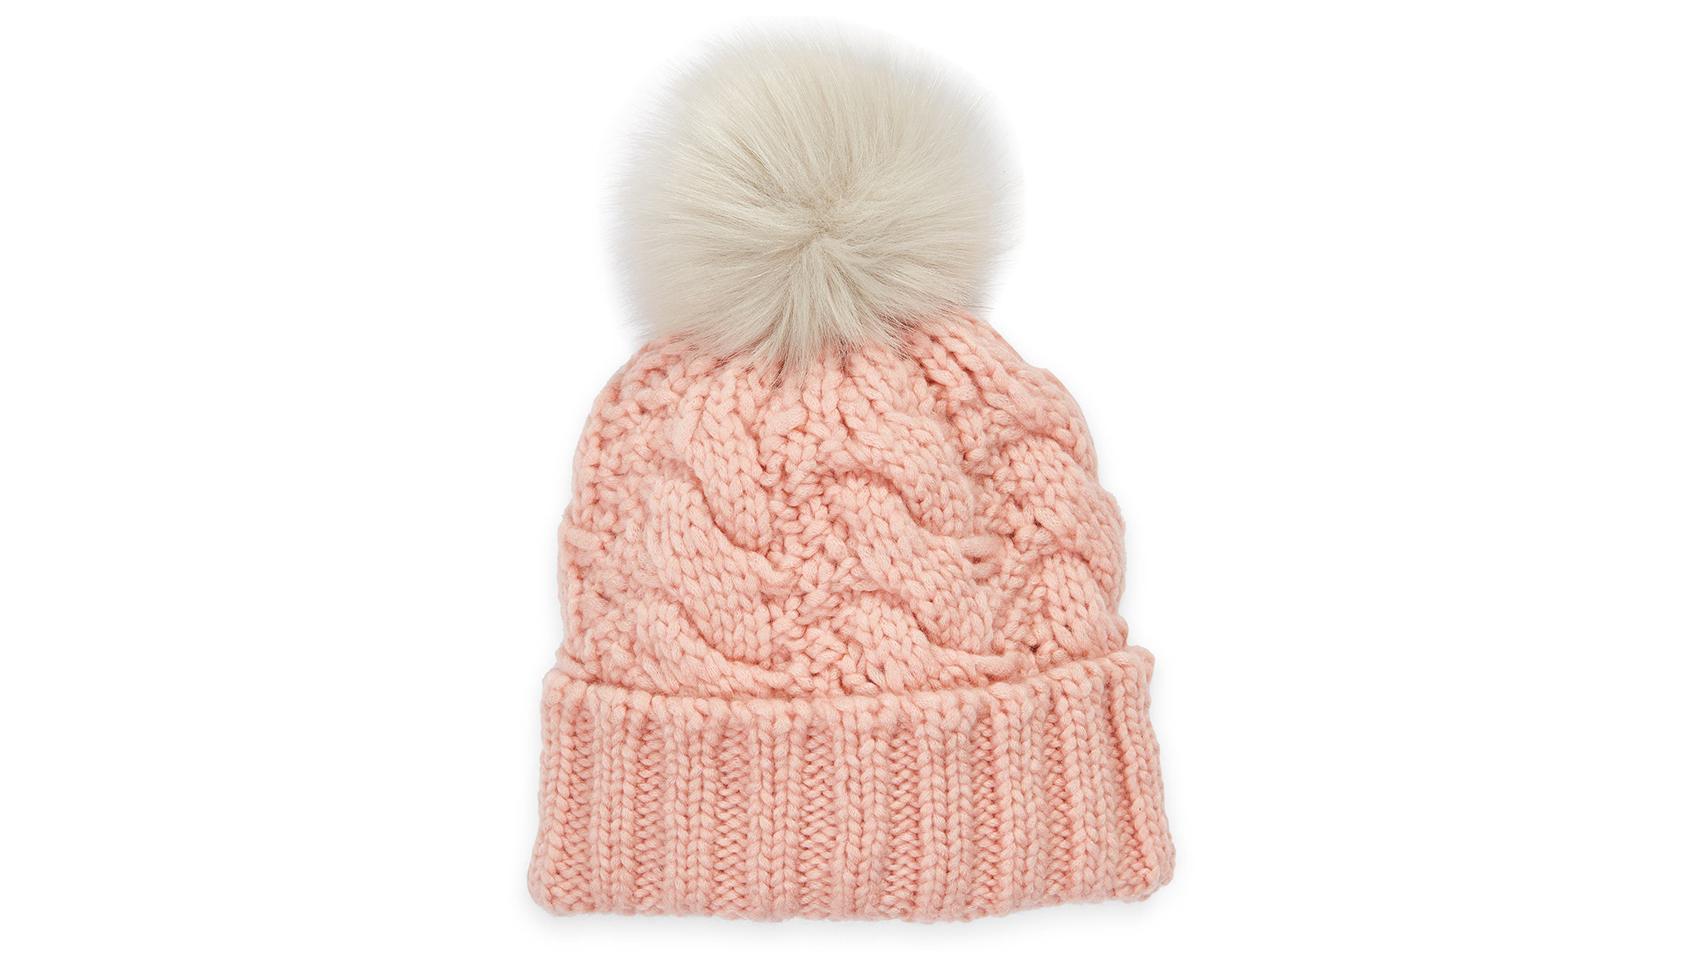 The Best Winter Hats For Women Cnn Underscored